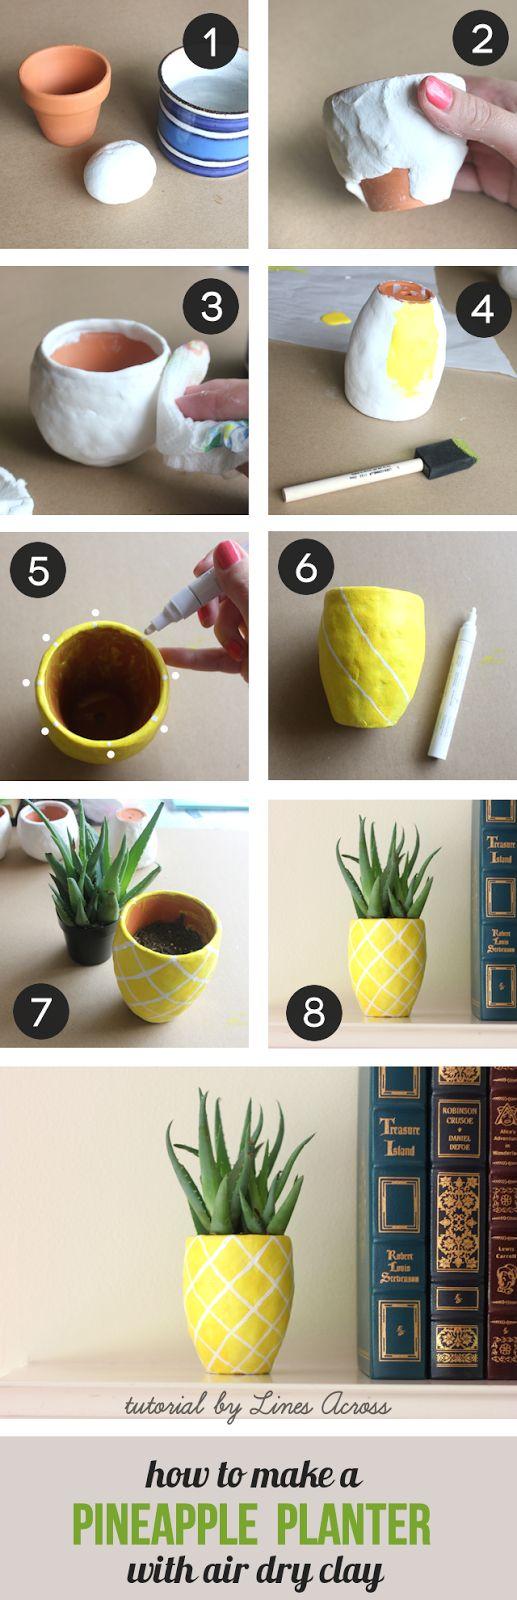 """Lines Across"": DIY Succulent Pineapple Planter"